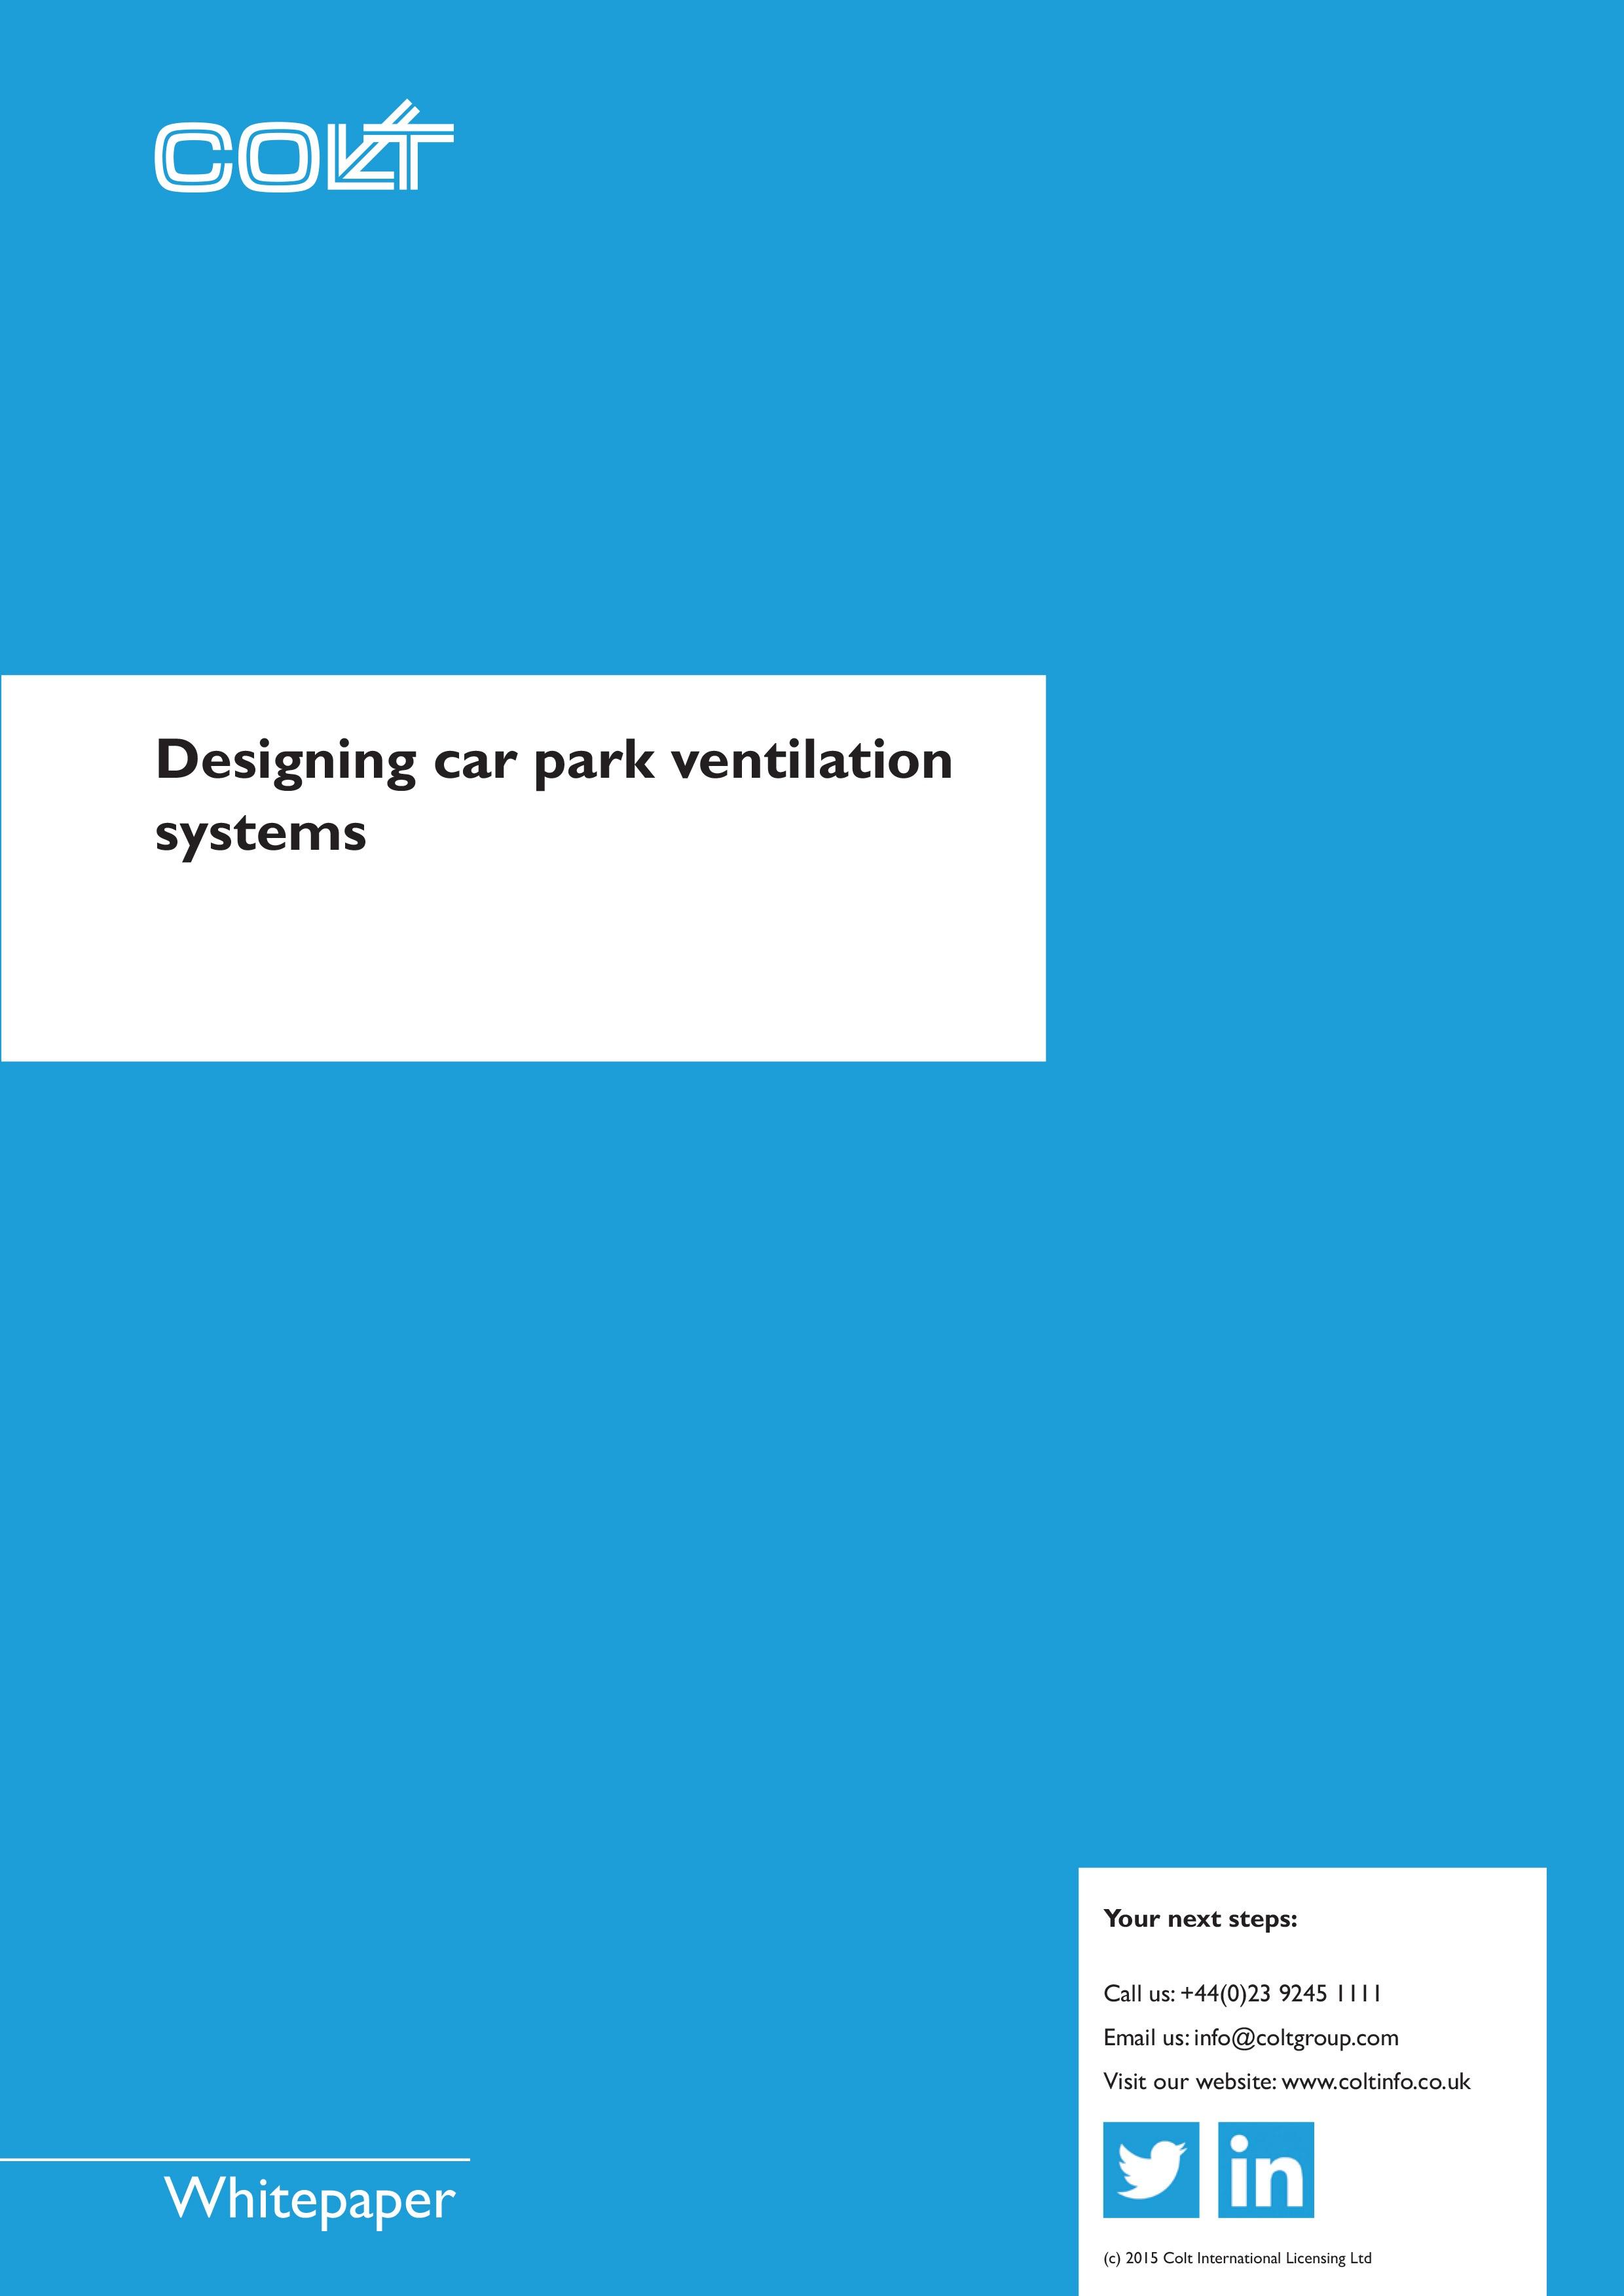 185_Whitepaper_Car_park_ventilation